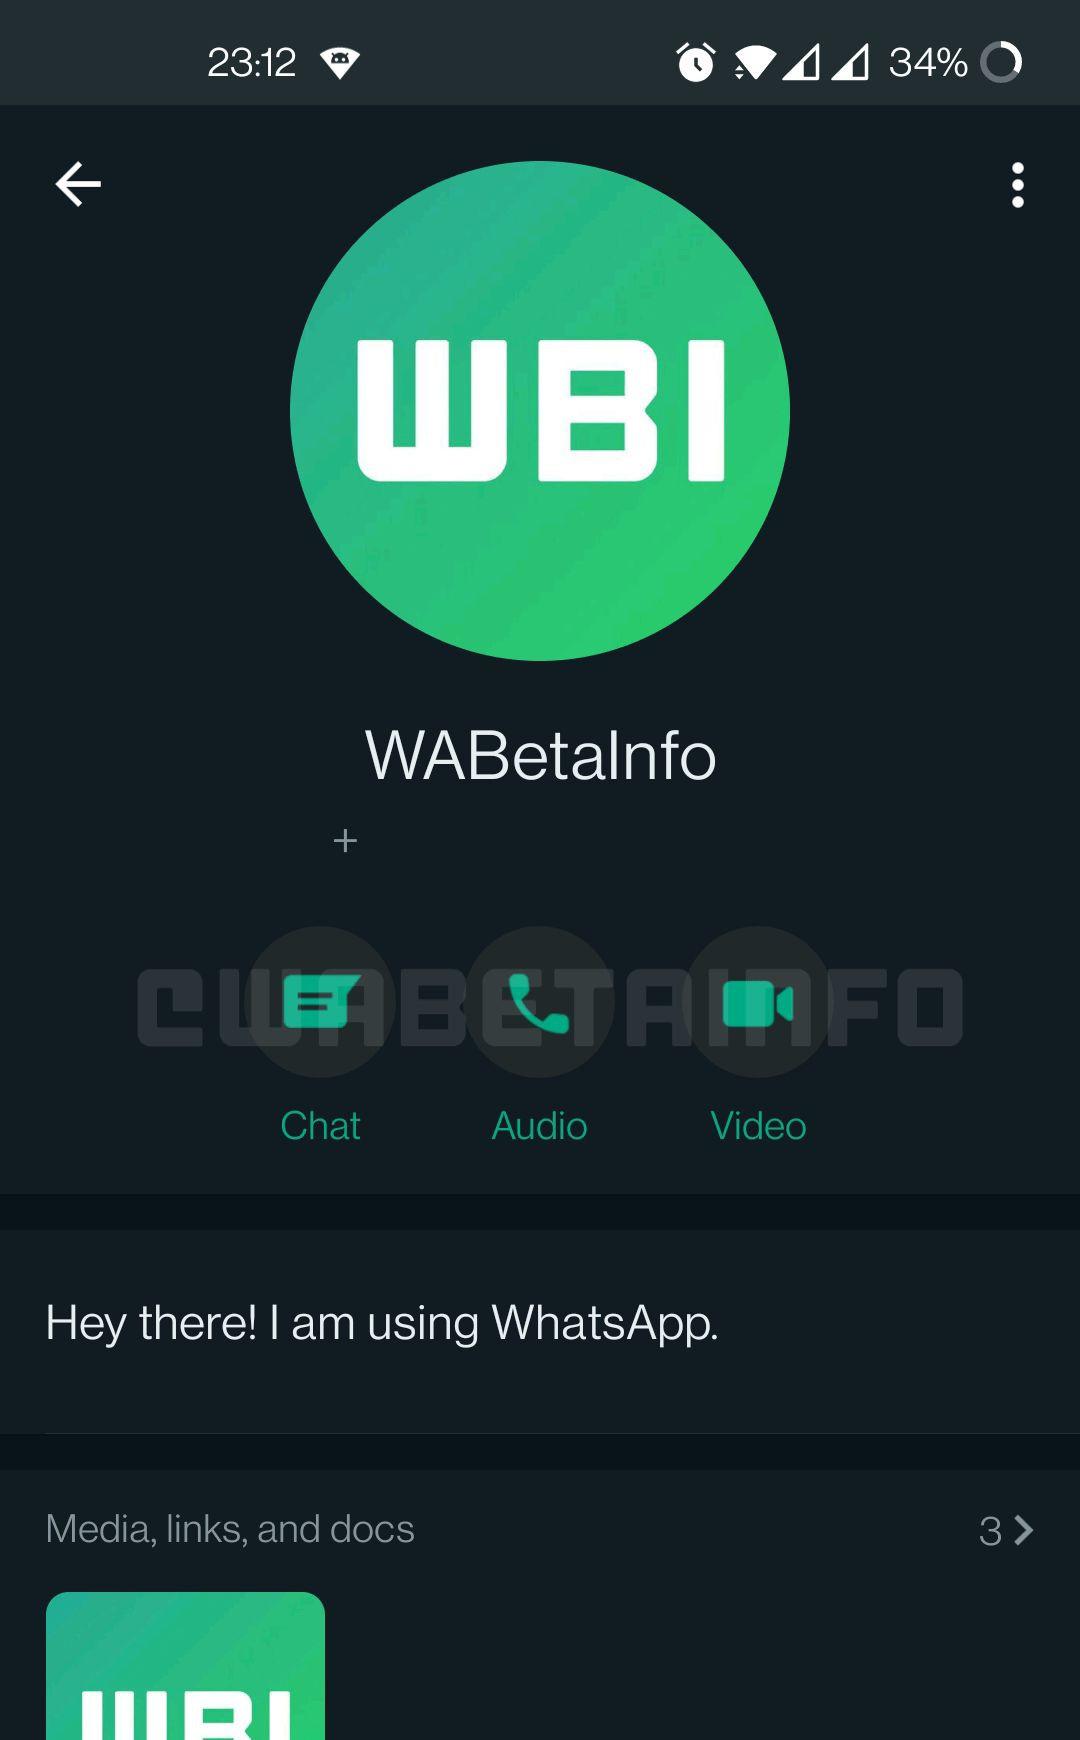 whatsapp arayuz degisikligi Hfd7